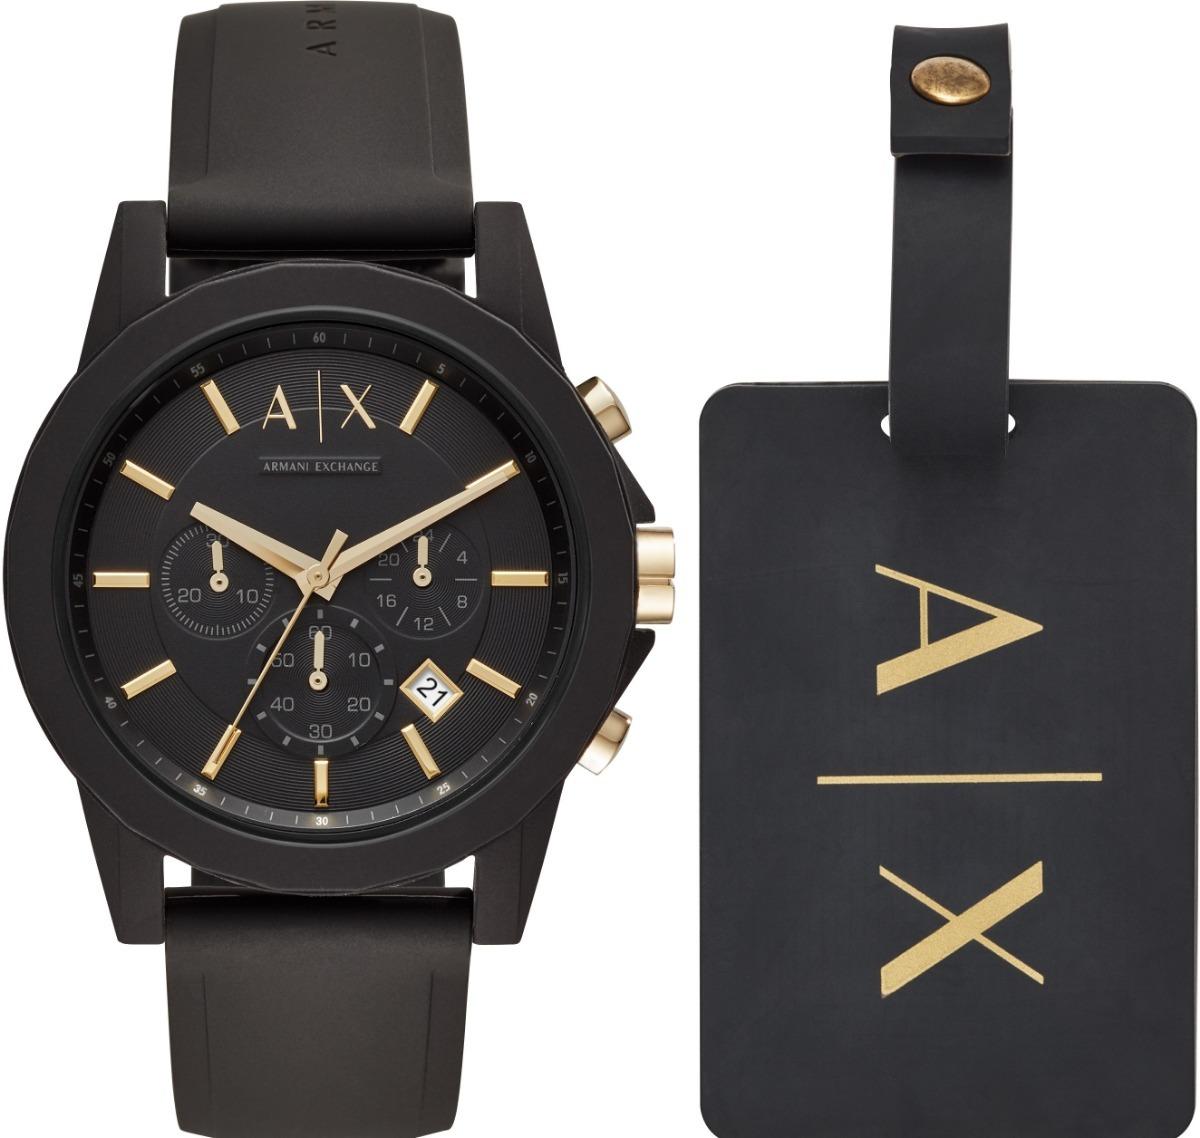 ab23e8c54fde reloj armani exchange set ax7105 chrono silicona negro homb. Cargando zoom.